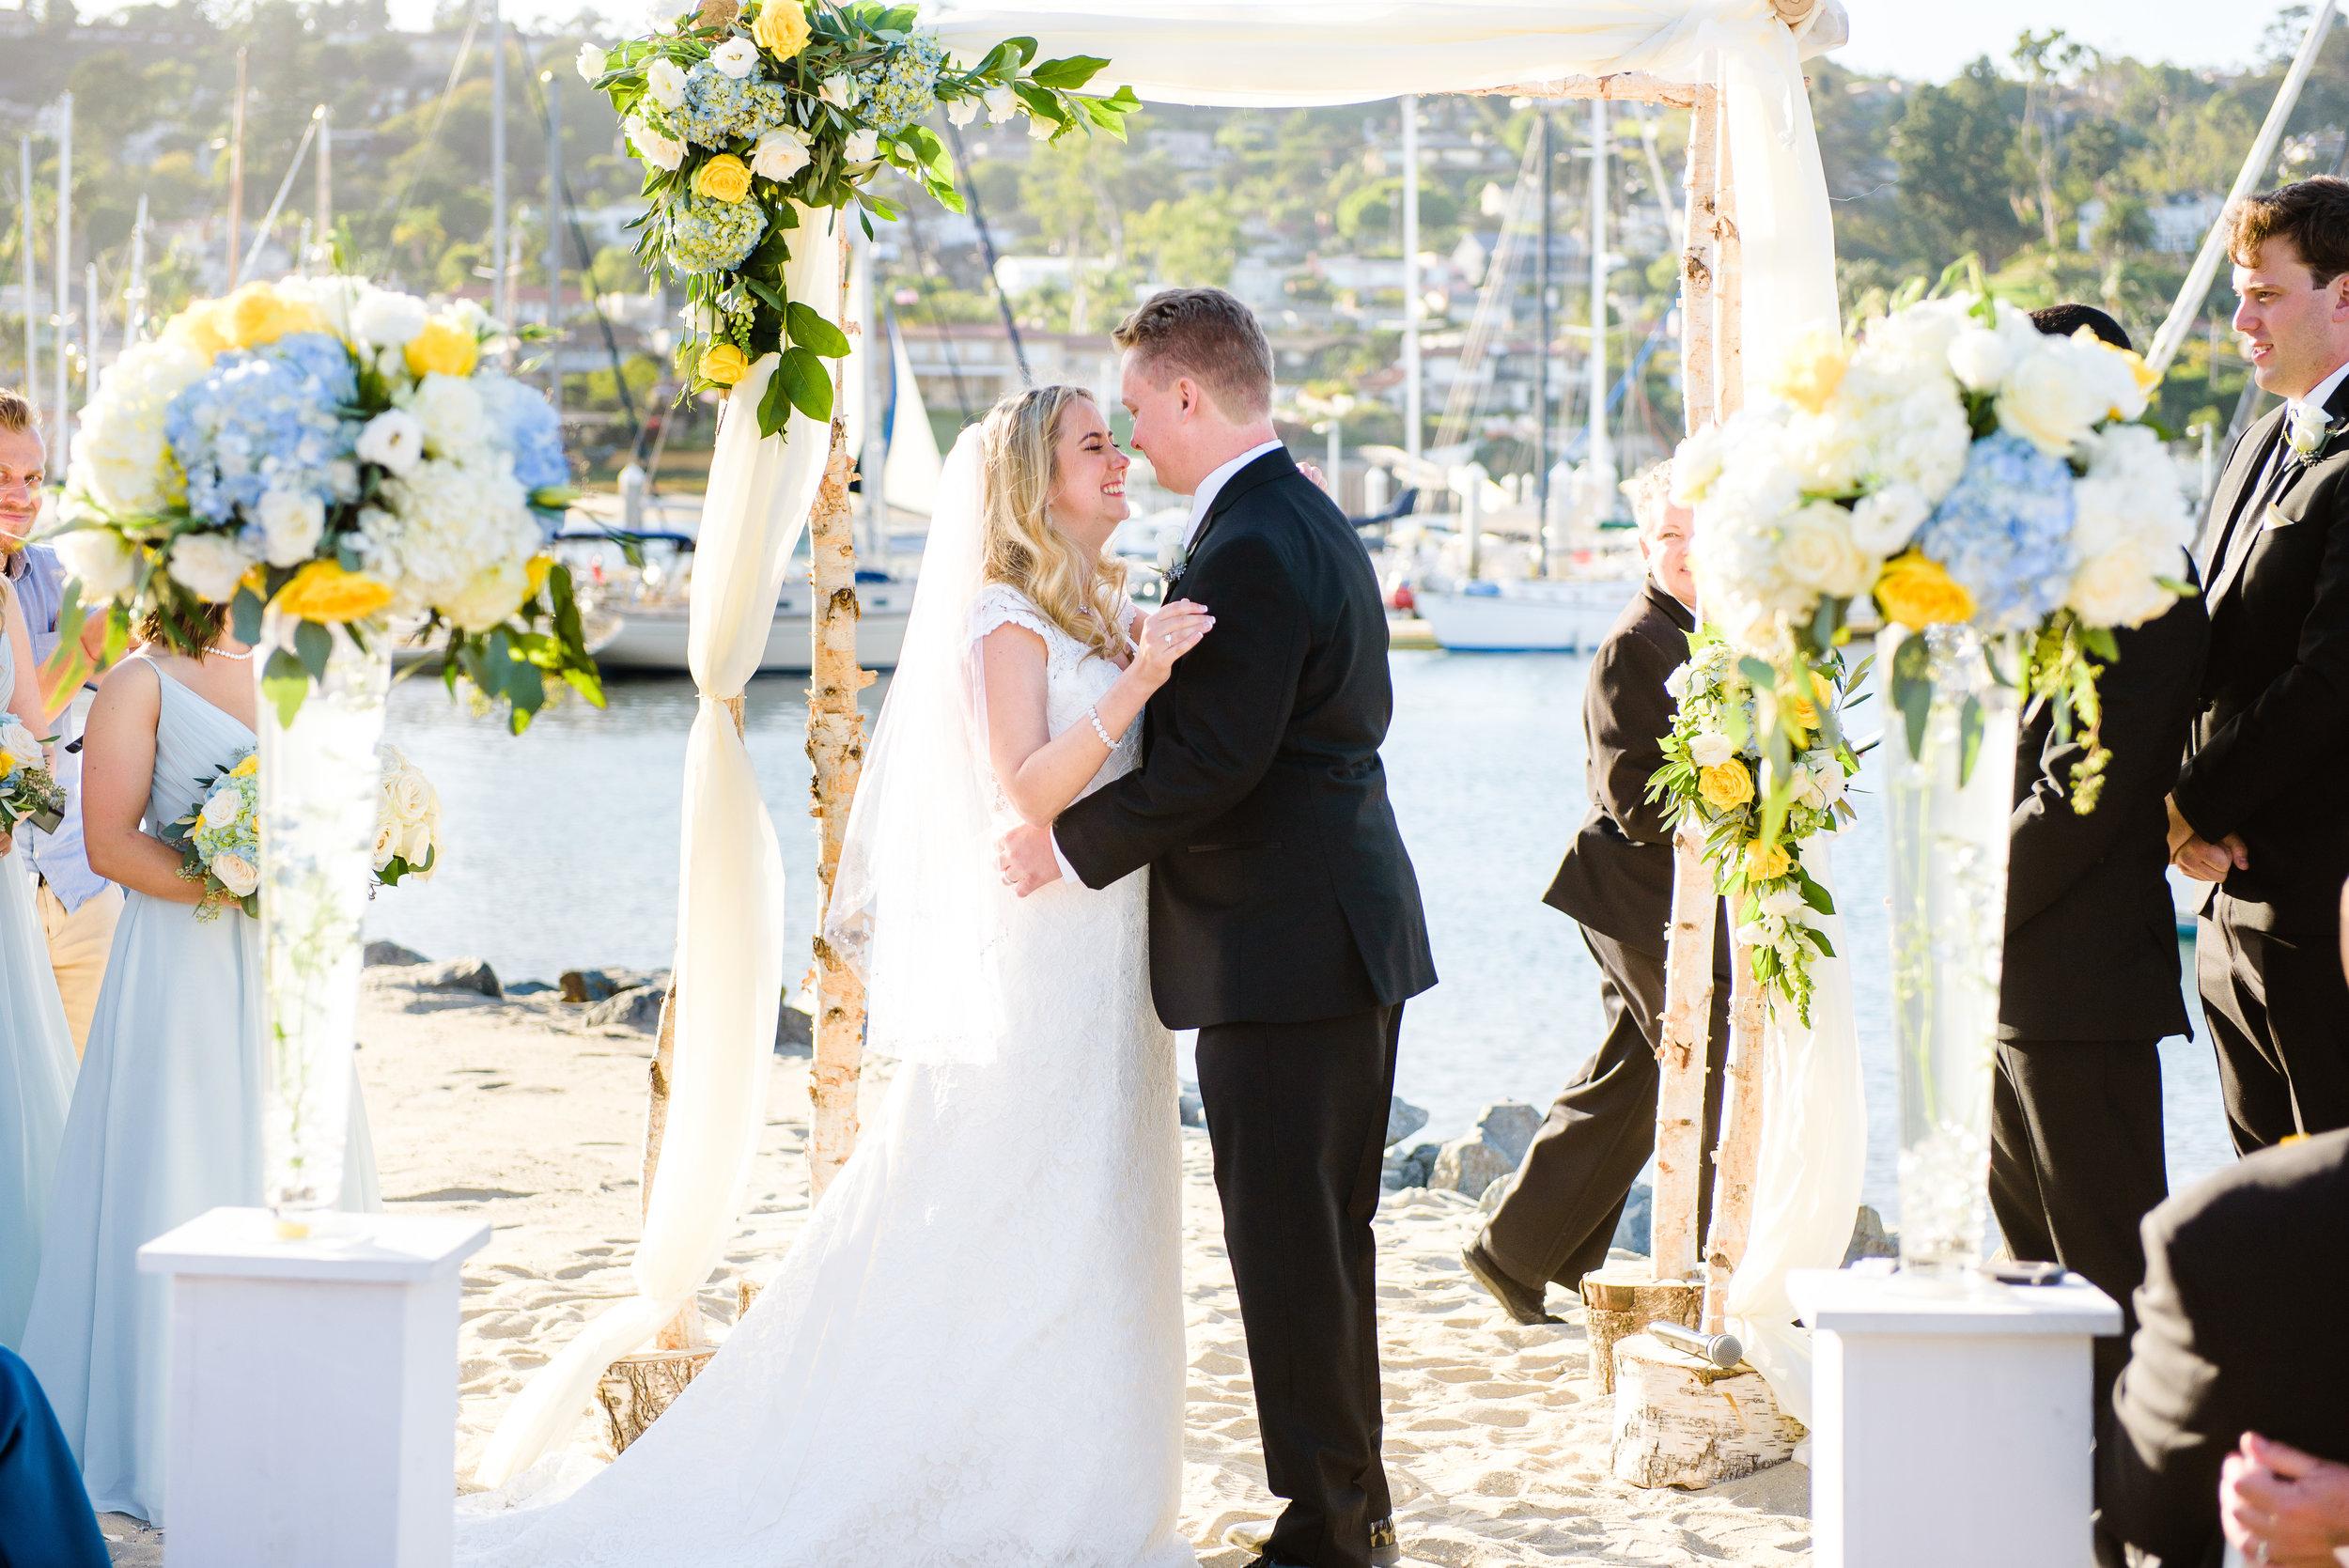 9.22.17+-+Avery+and+Cory+Wedding+-+Kona+Kai+-+Paul+Douda+Photography+-+565.jpg